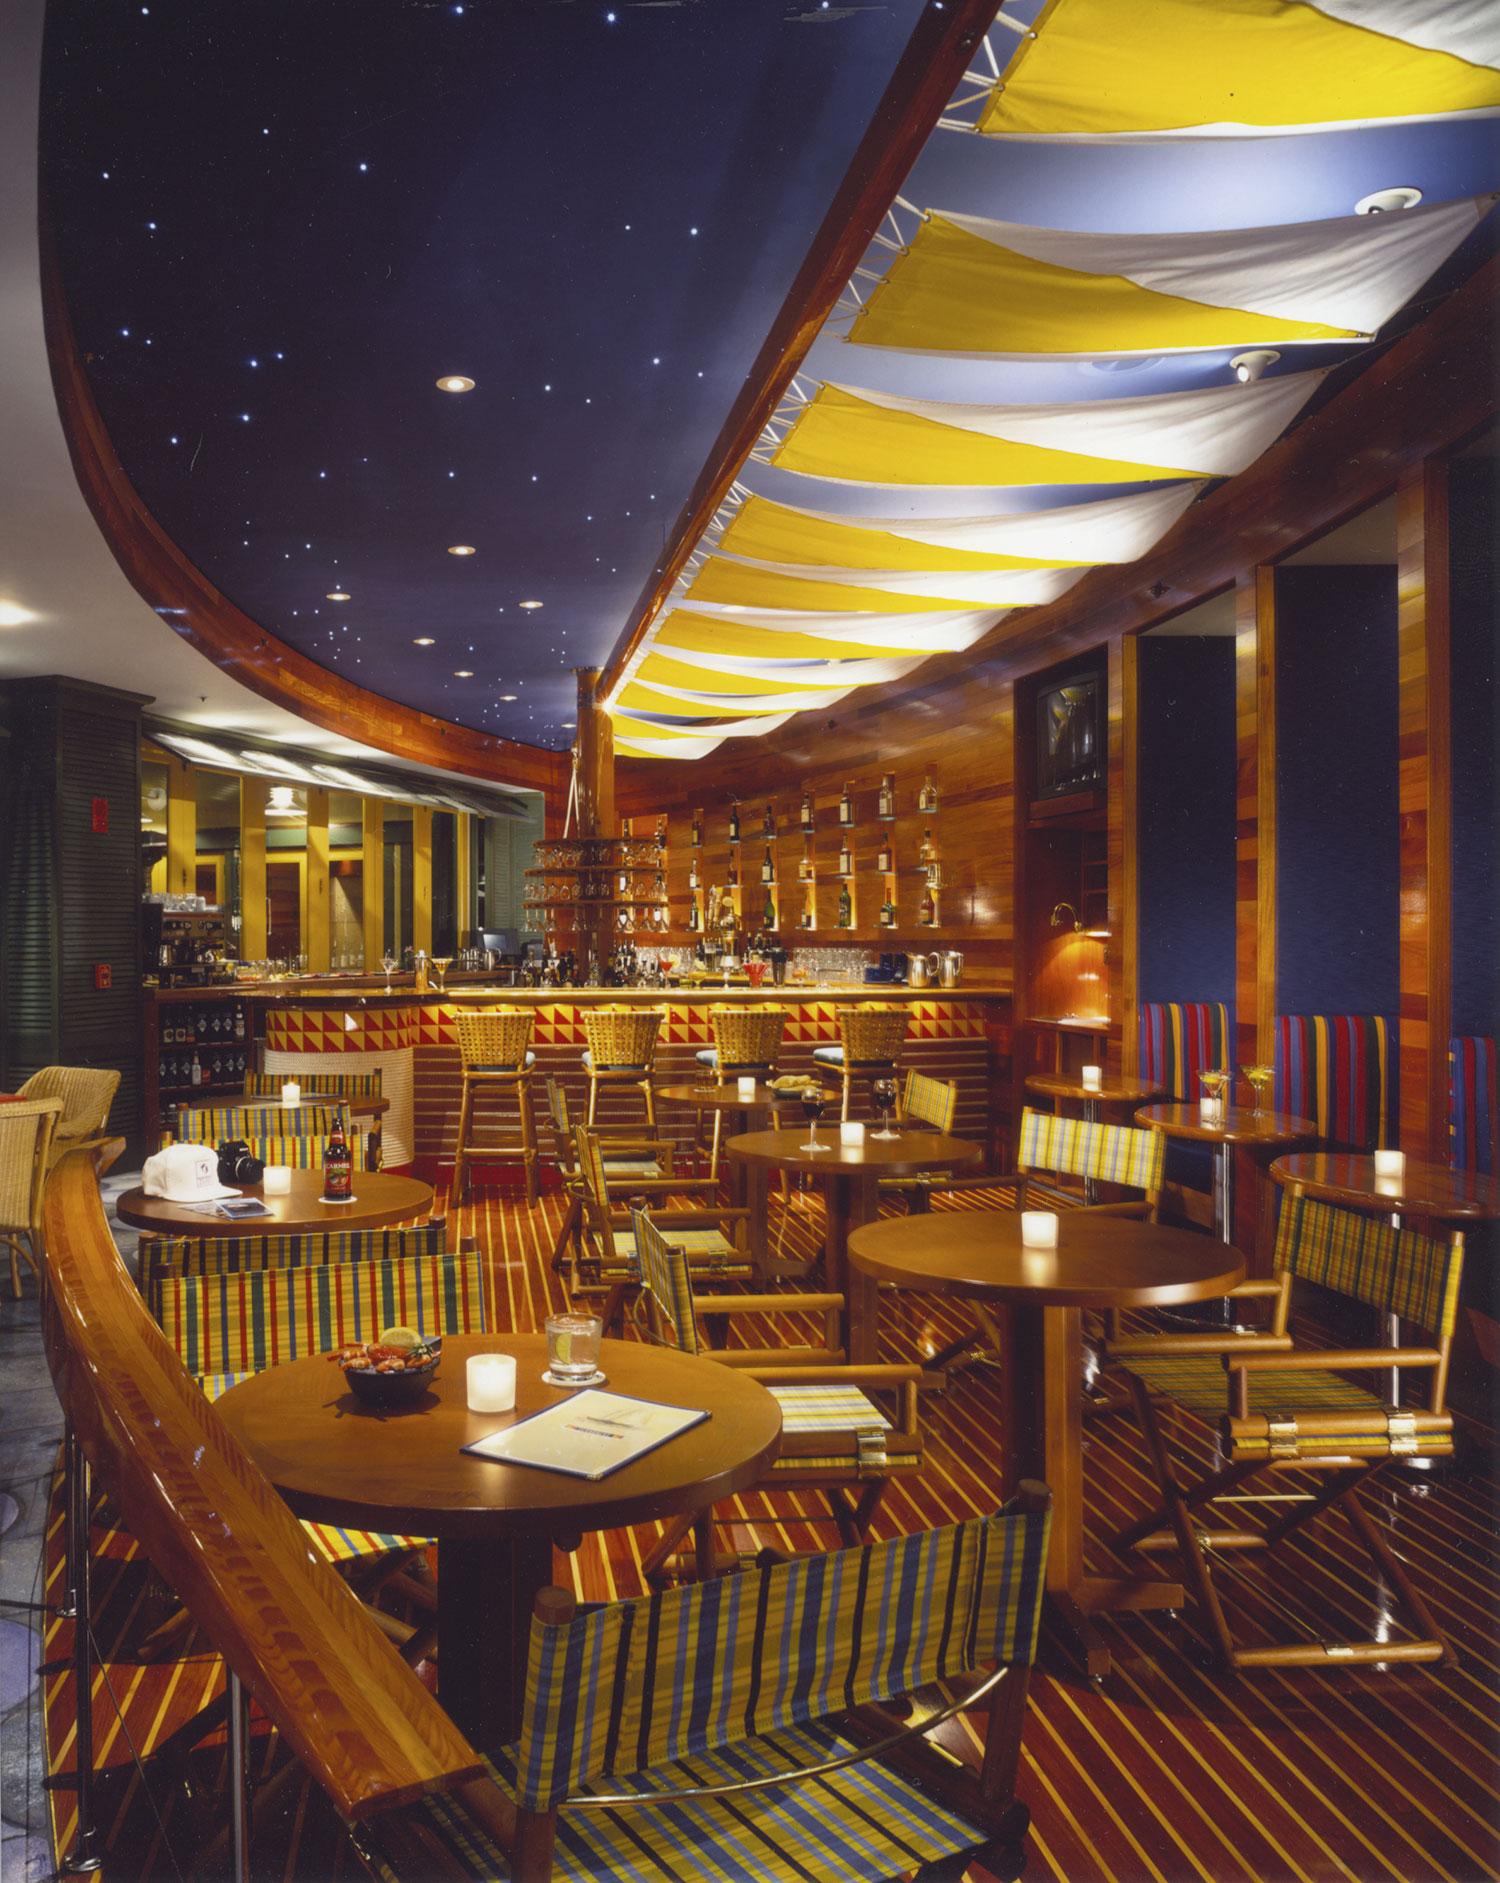 SCHOONERS BAR & BISTRO  work completed for former employer    Architect: Brayton & Hughes Design Studio  Project Designer: Timothy Gemmill  Project Type: Bar & Bistro, Monterey Plaza Hotel  Year of Completion: 1996